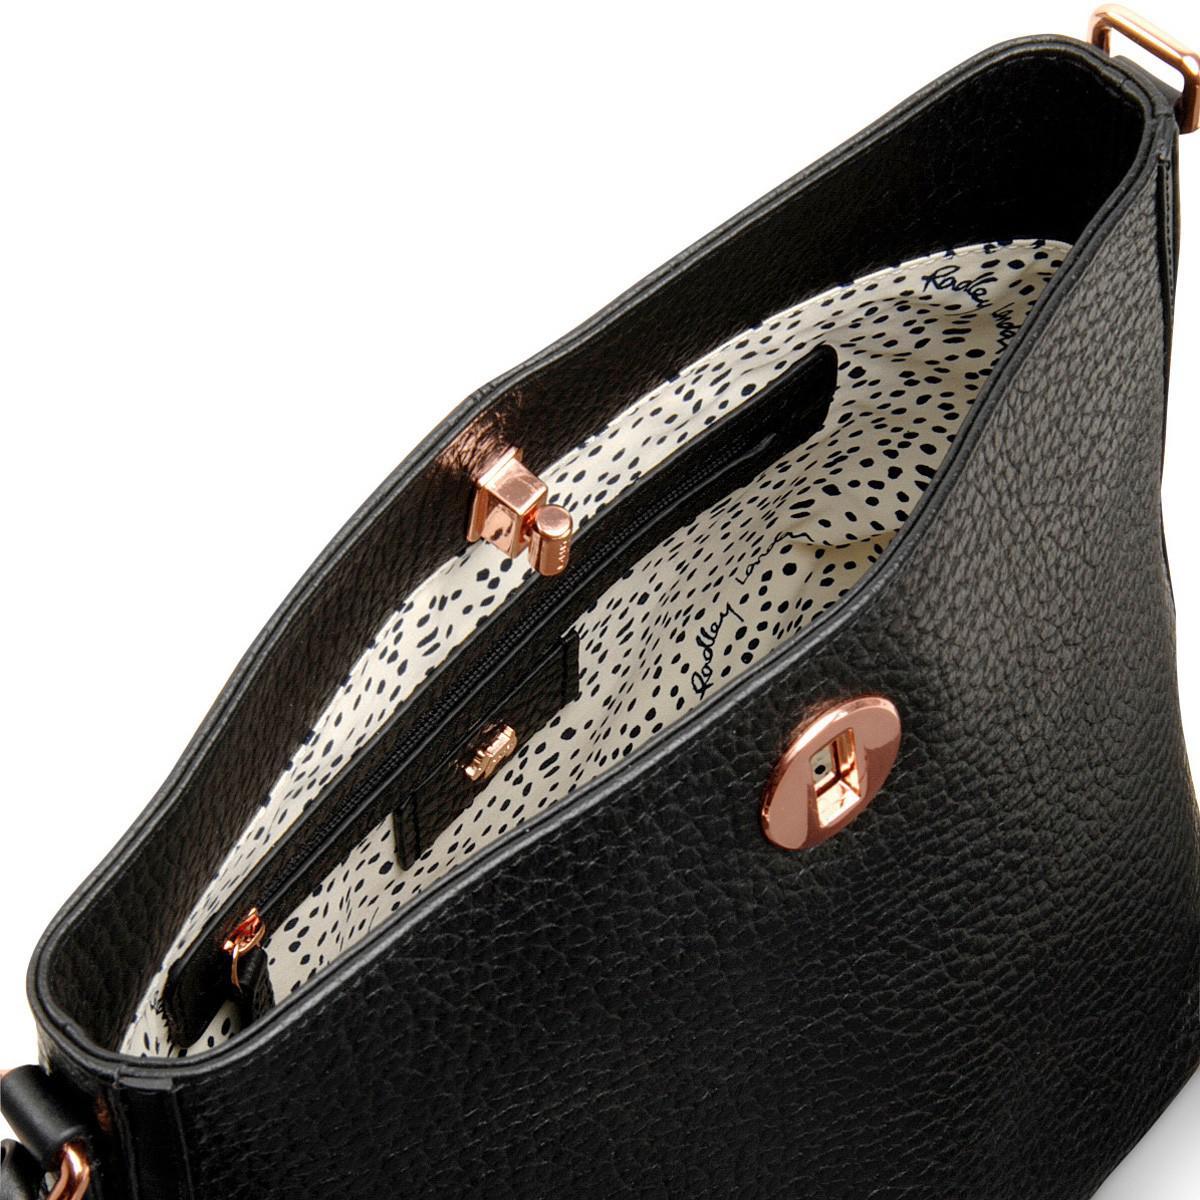 Radley Leather Carey Street Medium Bucket Cross Body Bag in Black